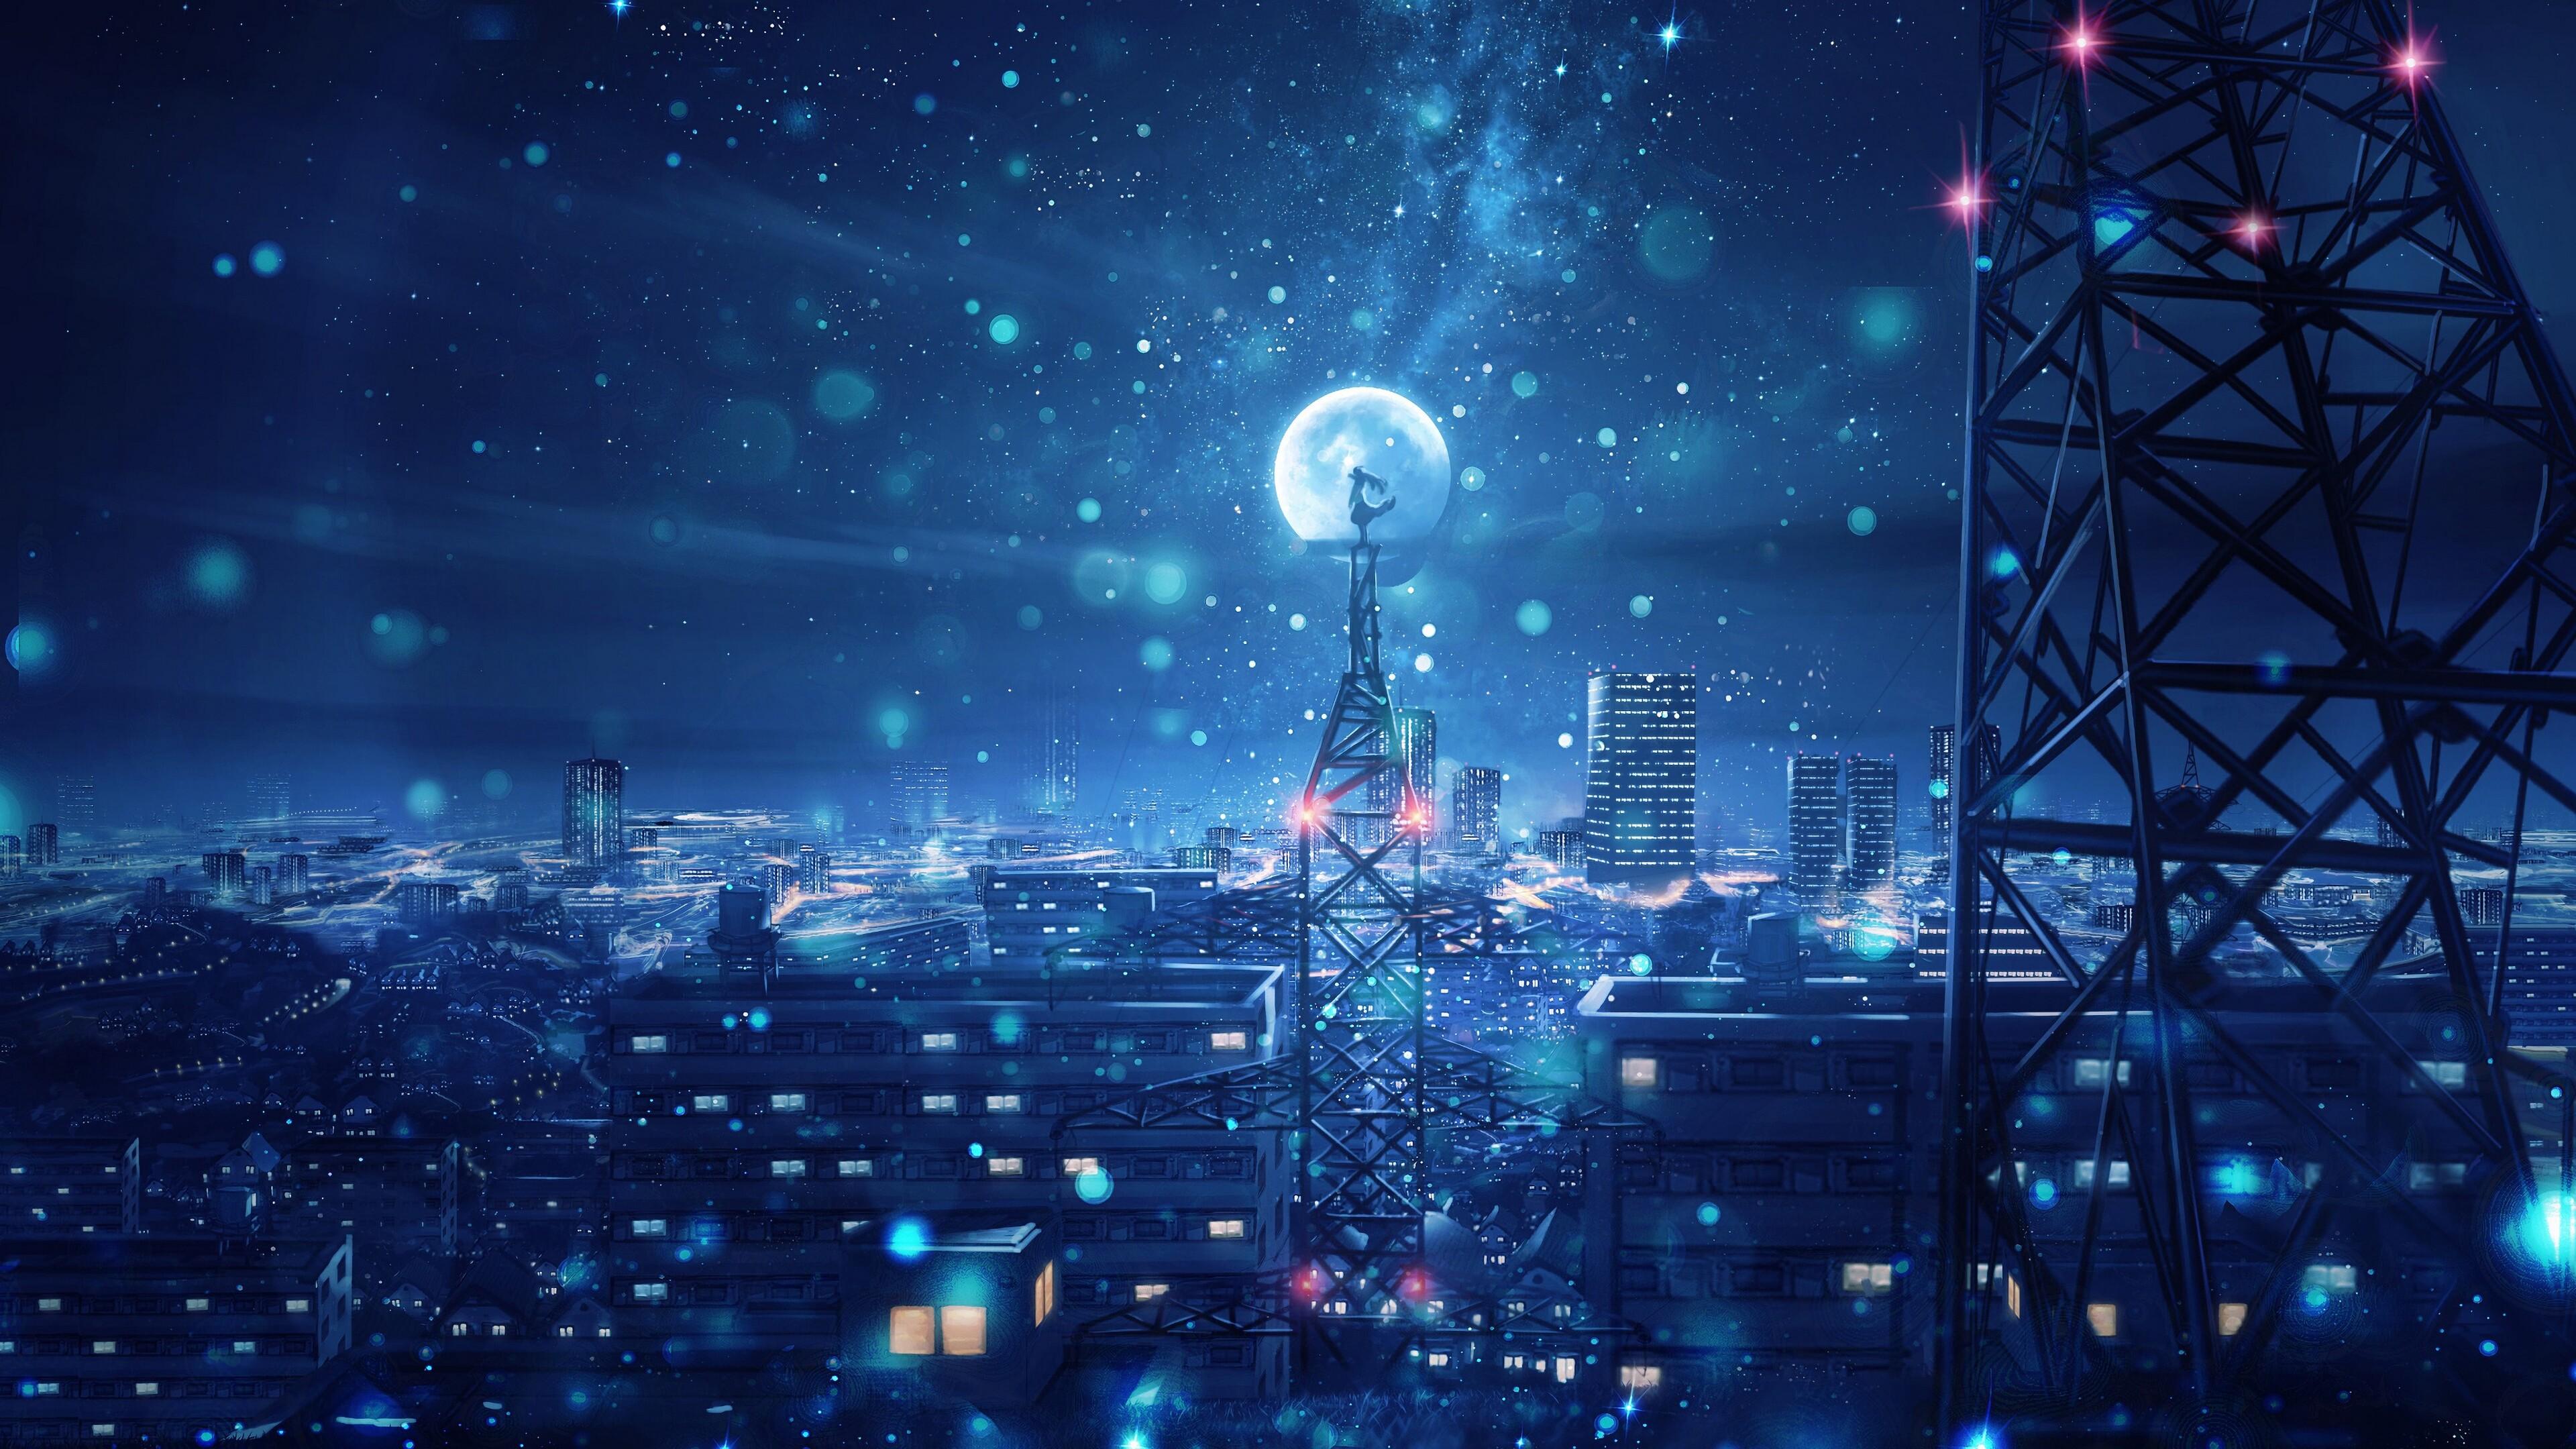 3840x2160 Blue Night Big Moon Anime Scenery 4k 4k HD 4k ...